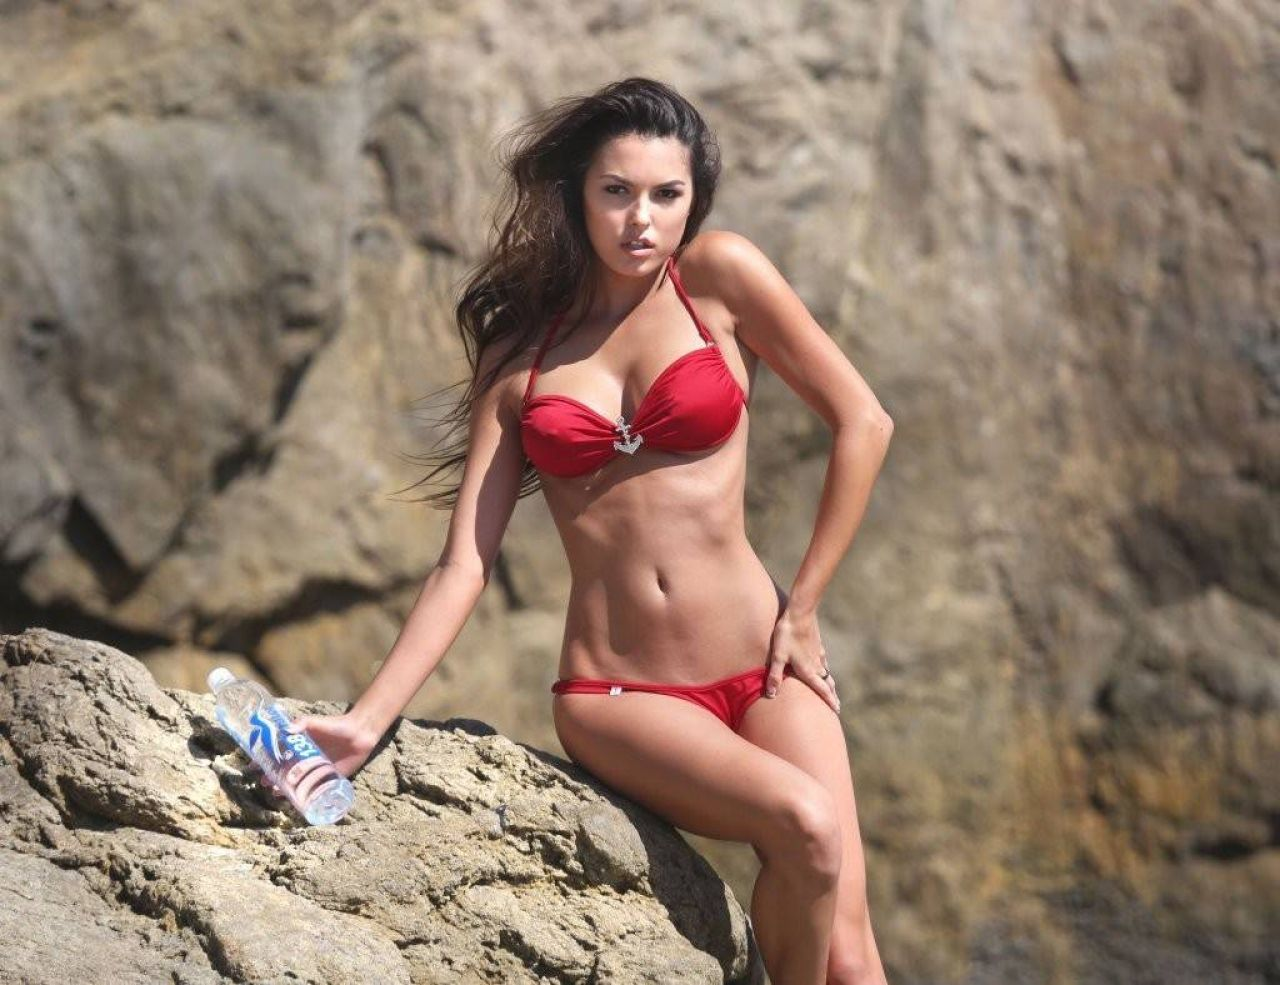 Paparazzi Constance Nunes naked (32 pics), Topless